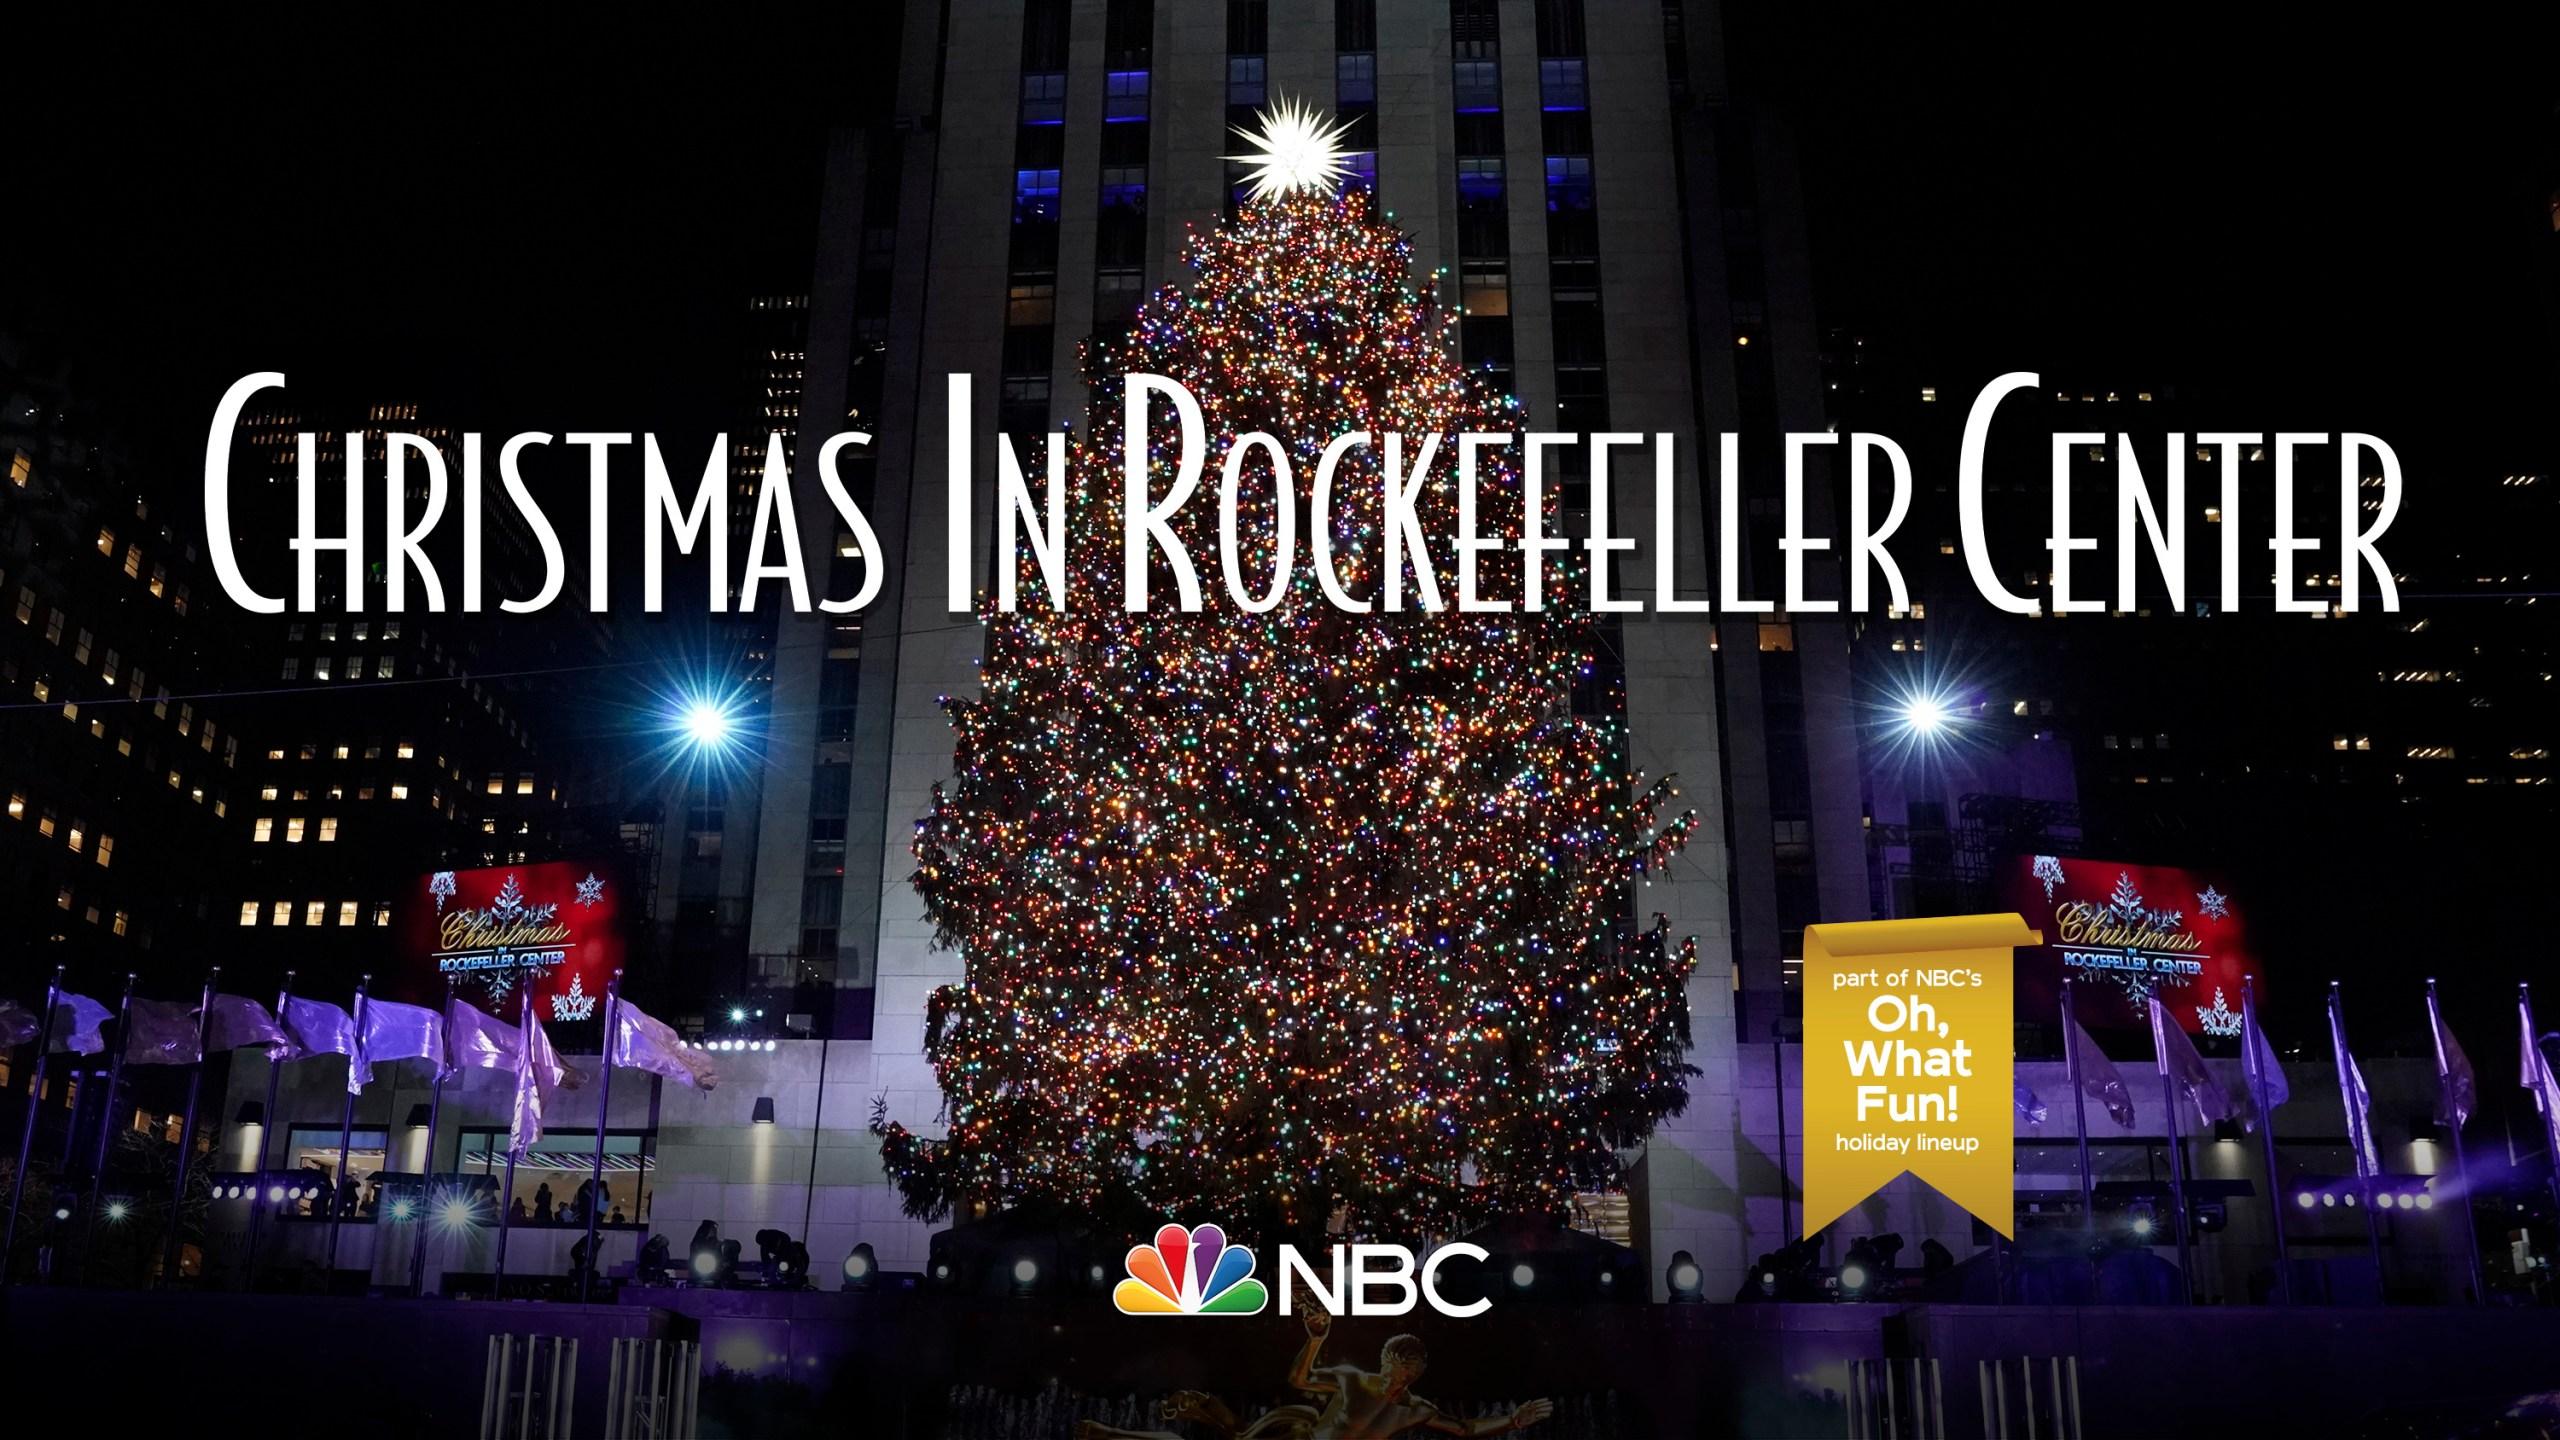 Nbc S Christmas In Rockefeller Center Special Returns Dec 4